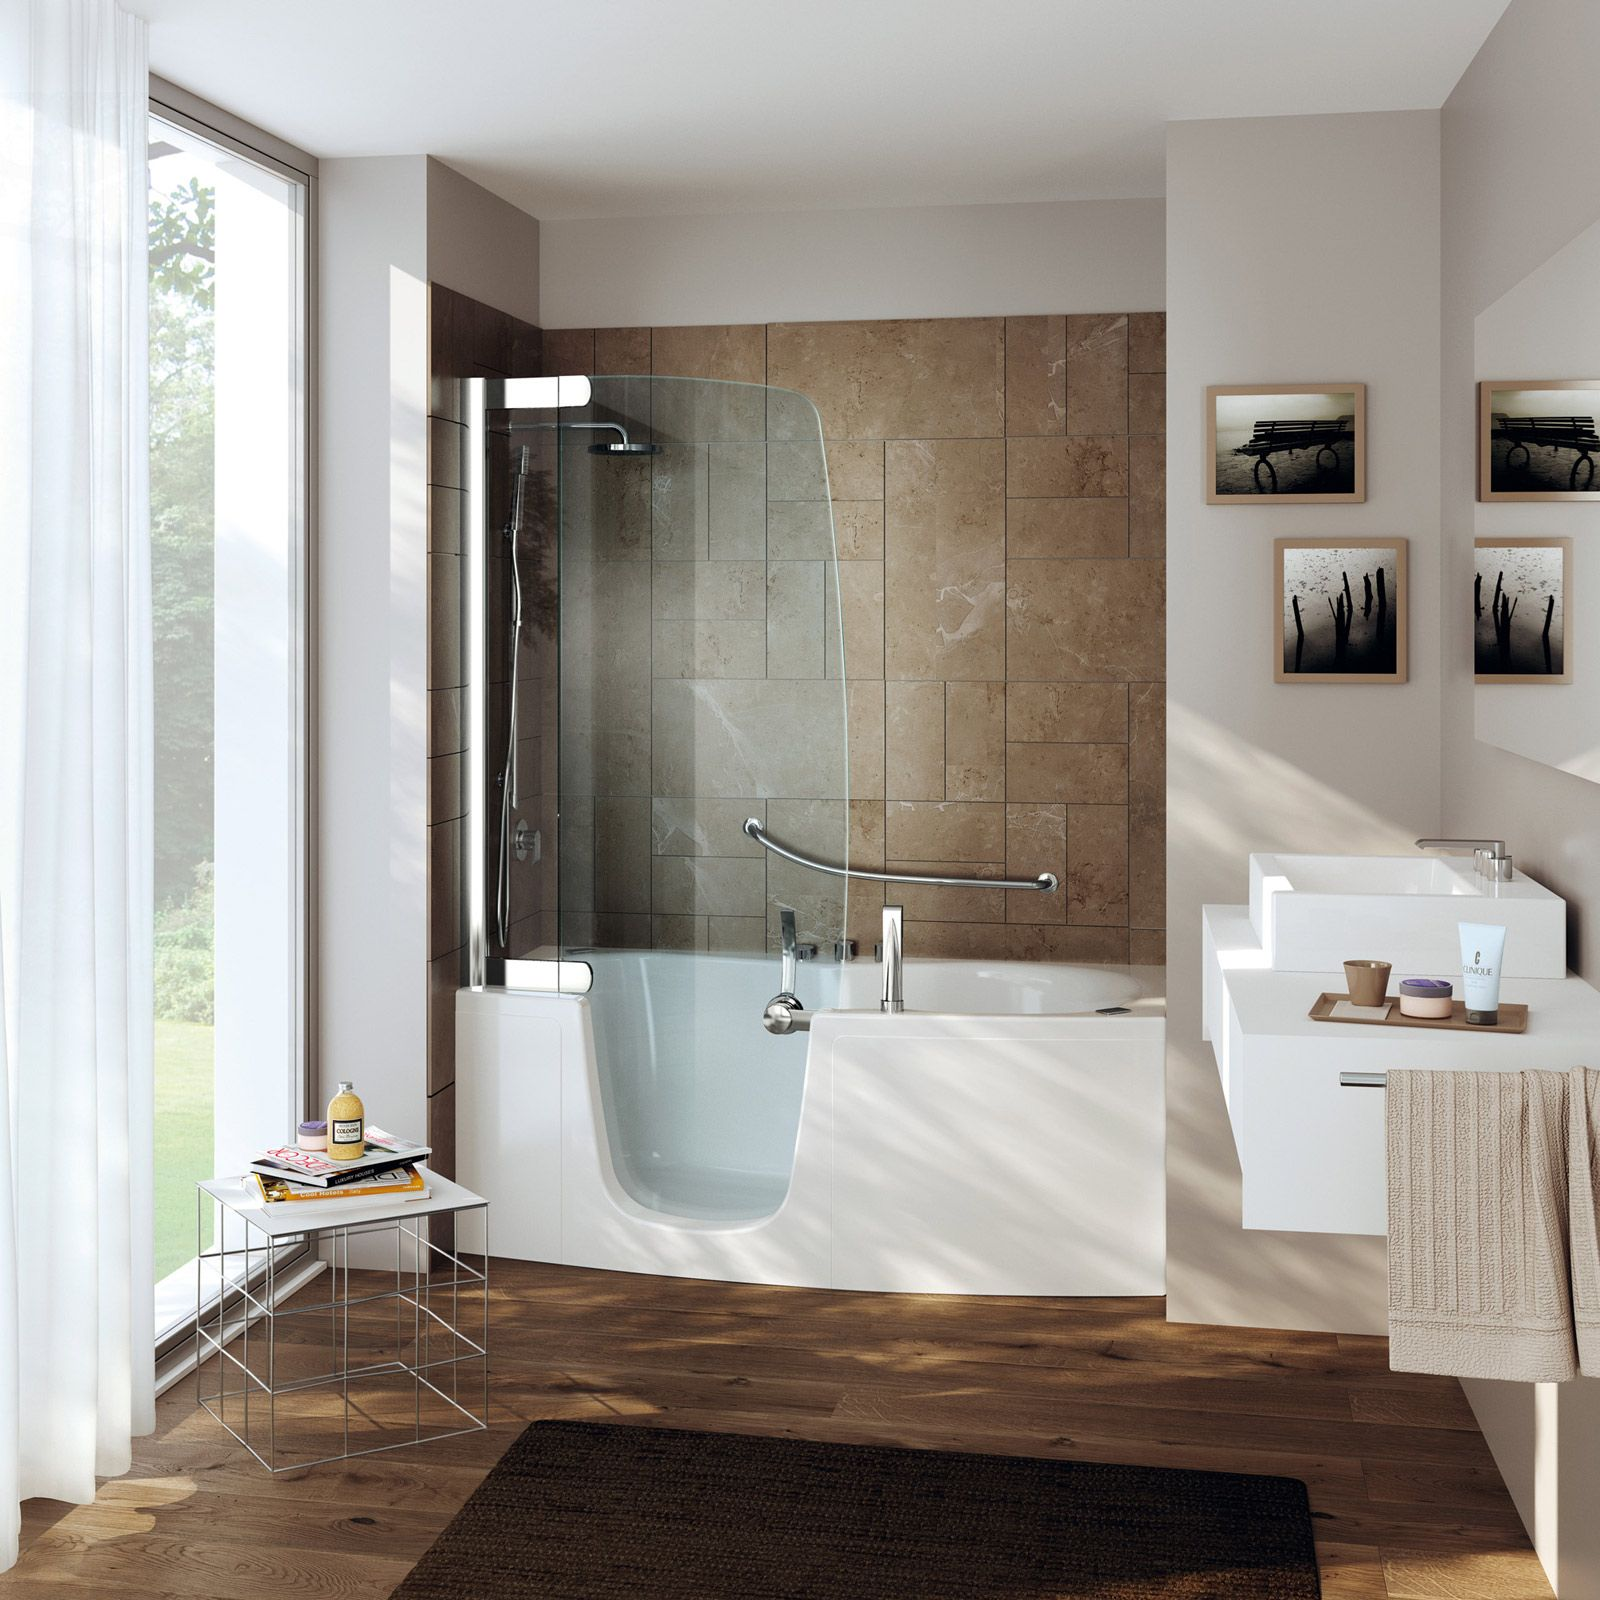 piccola vasca doccia moderna - Cerca con Google  bagni  Pinterest  Tubs, Design bathroom and ...